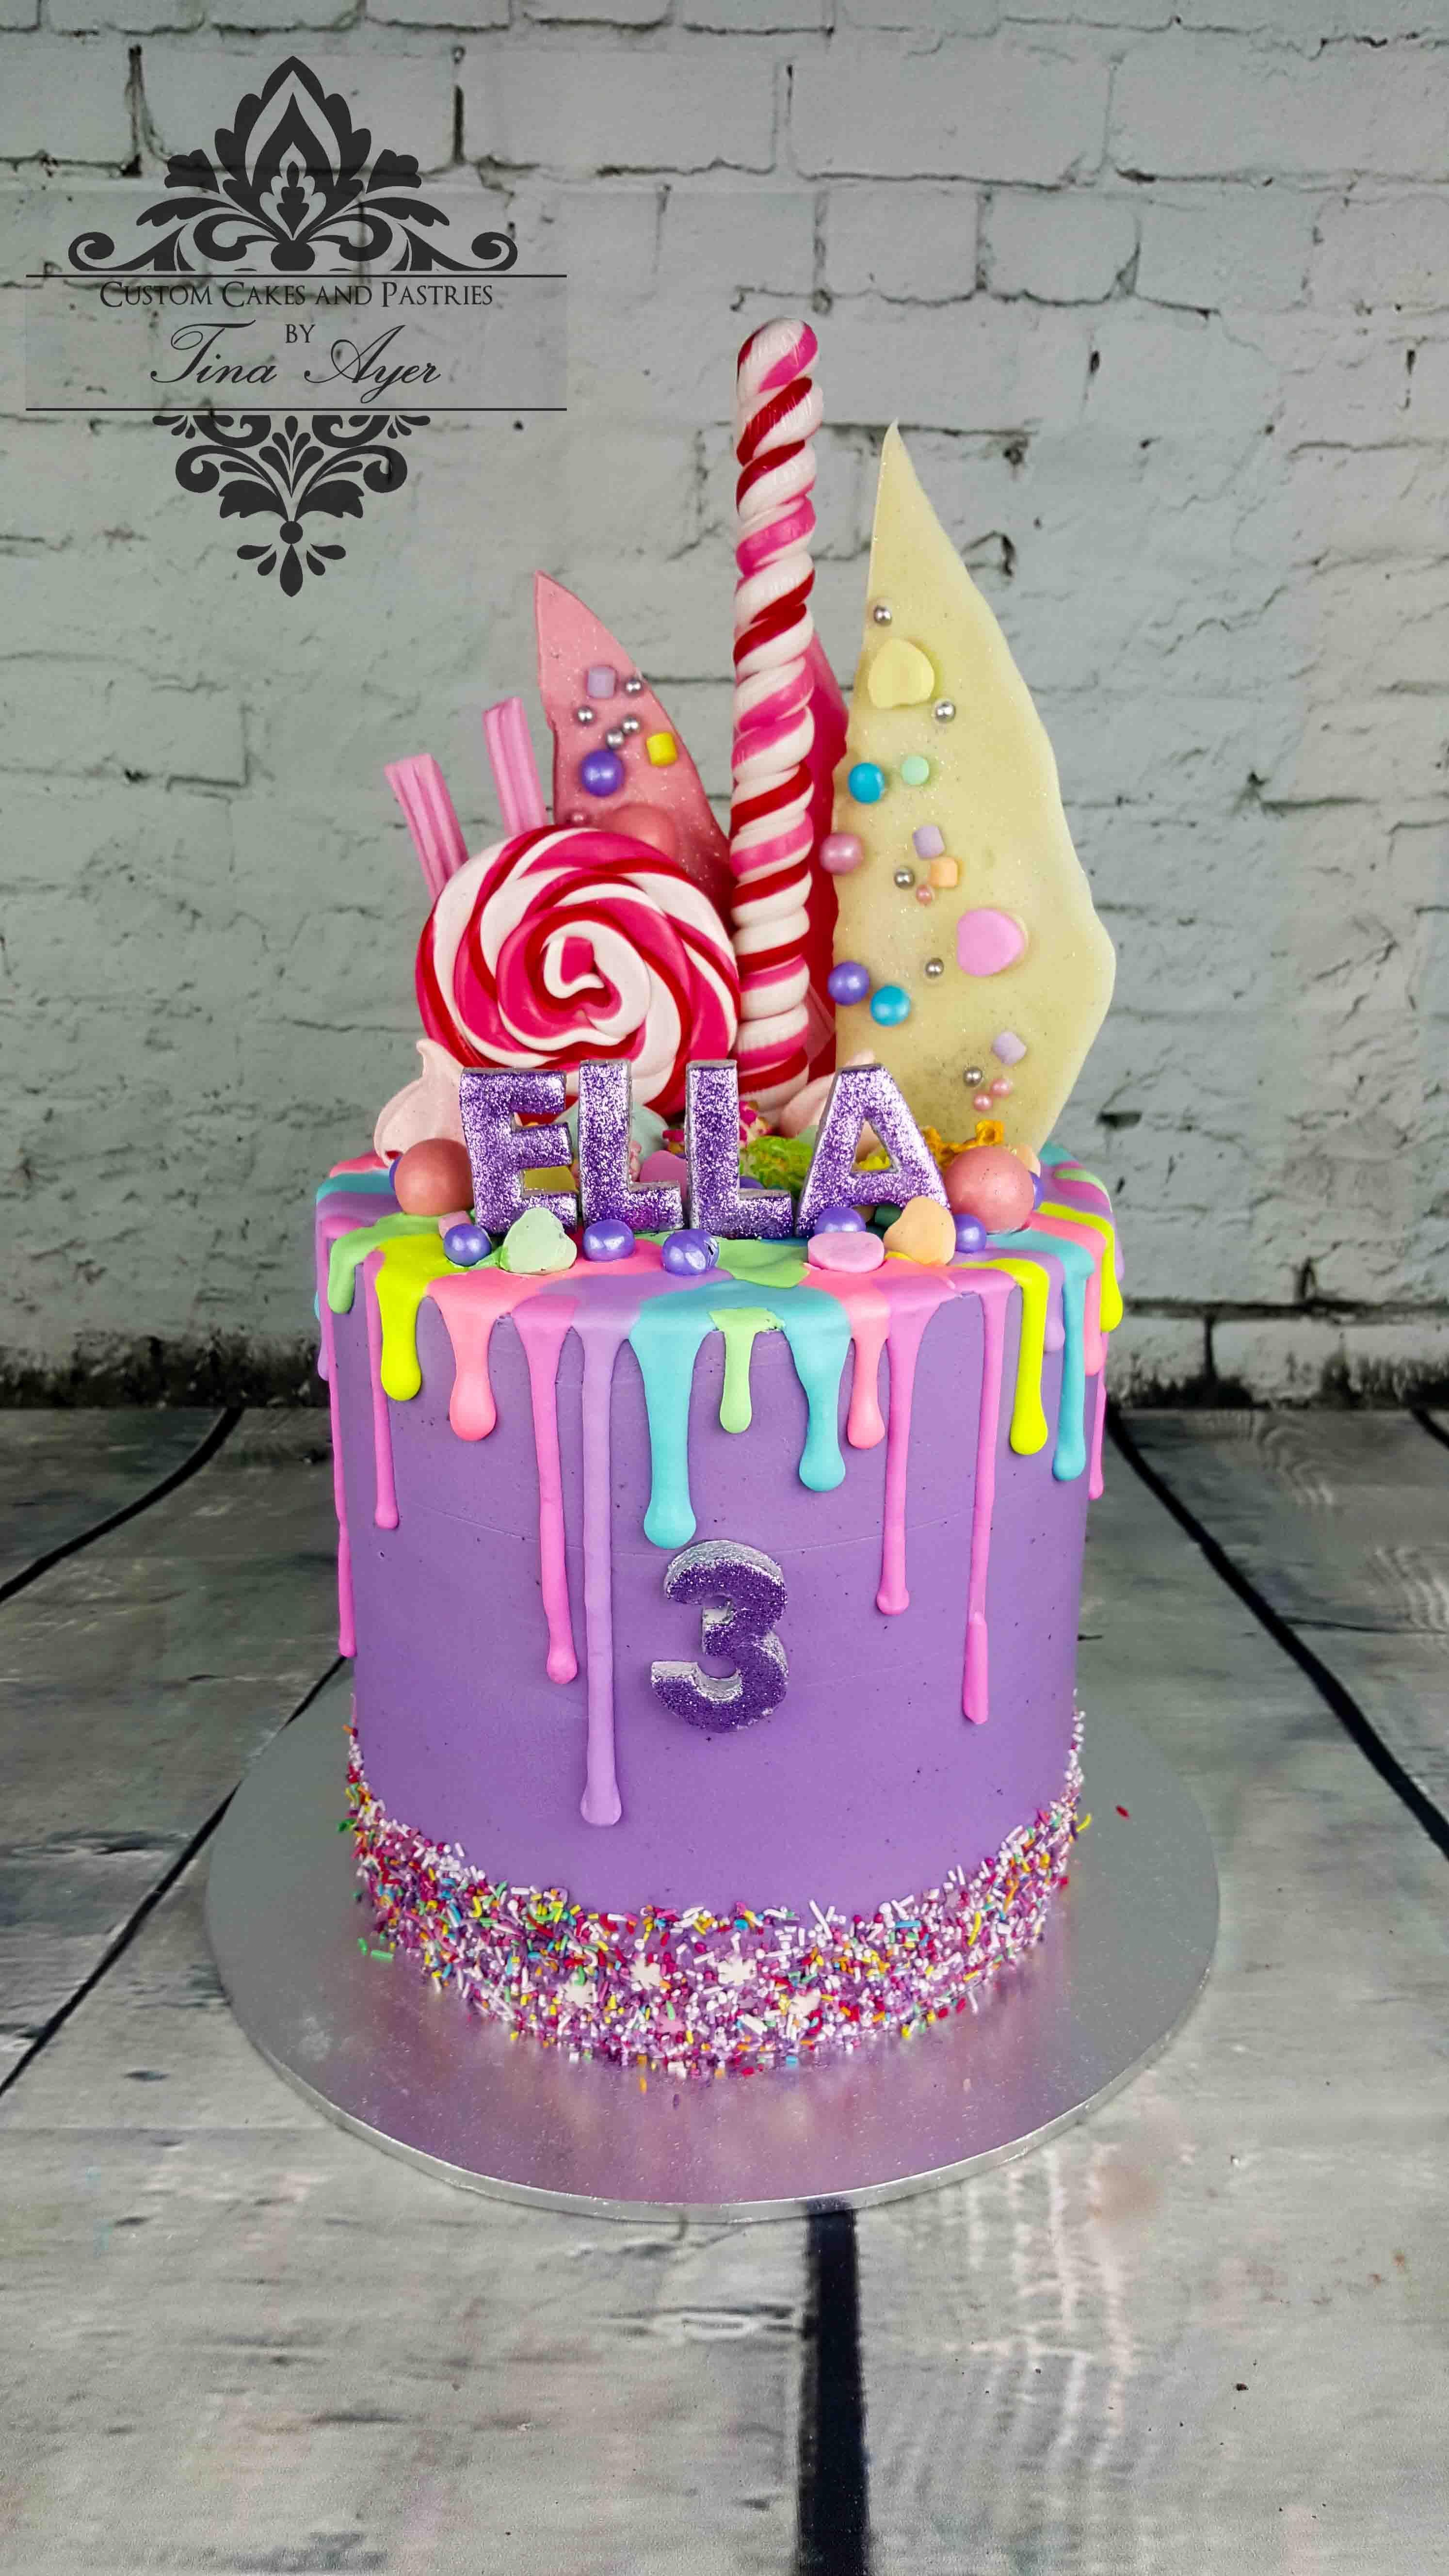 Neon Birthday Cake Designs The Best Cake Of 2018